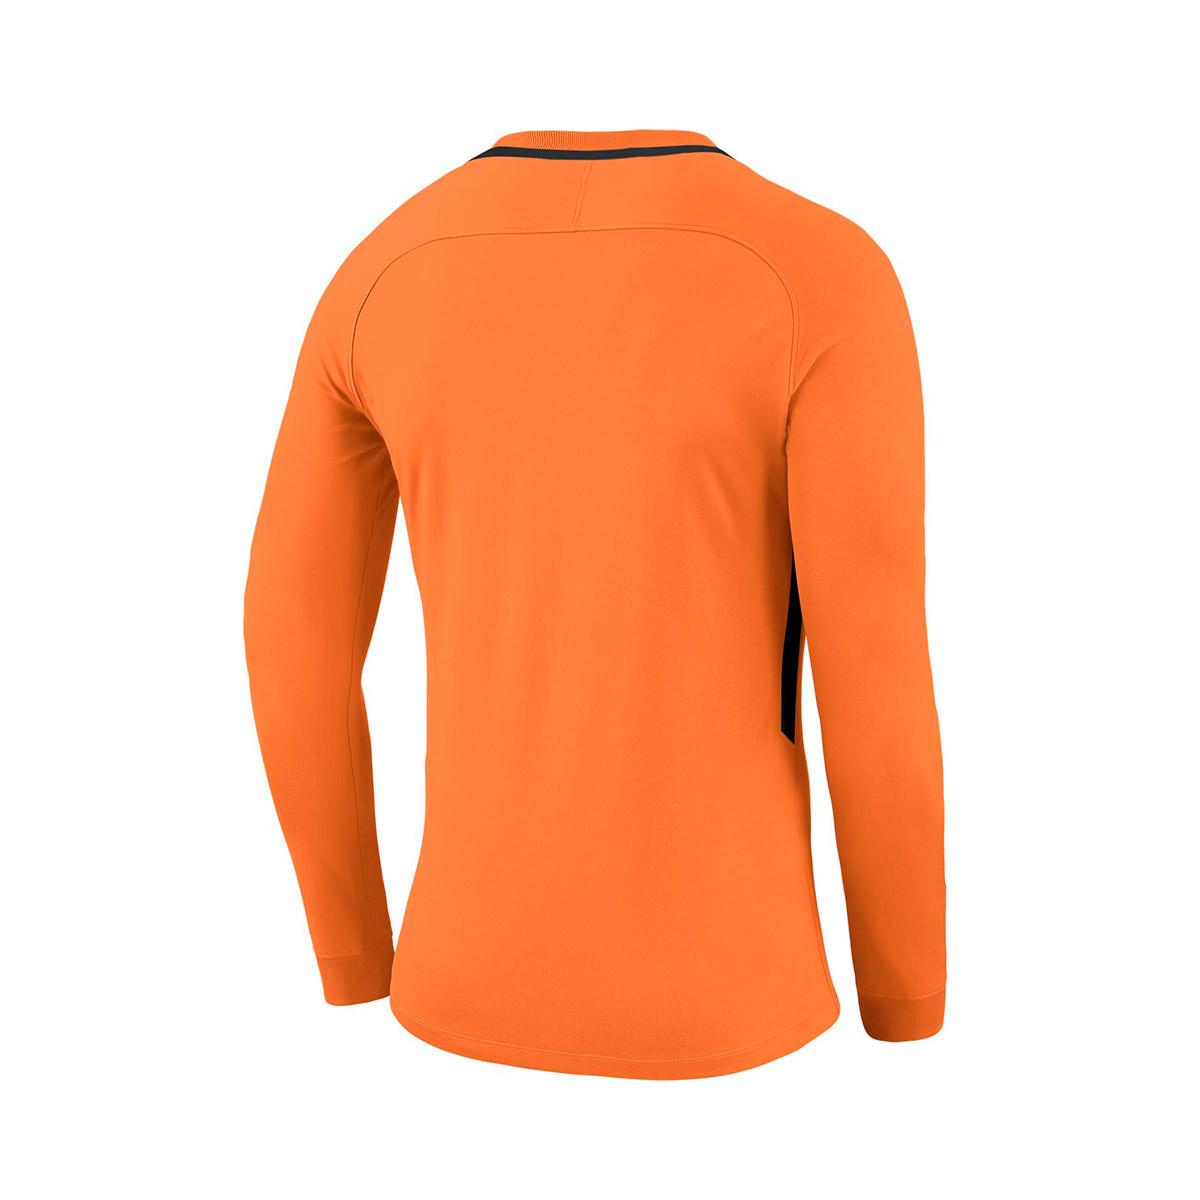 88aac1199 Jersey Nike Kids Park III Total orange-Black - Tienda de fútbol Fútbol  Emotion